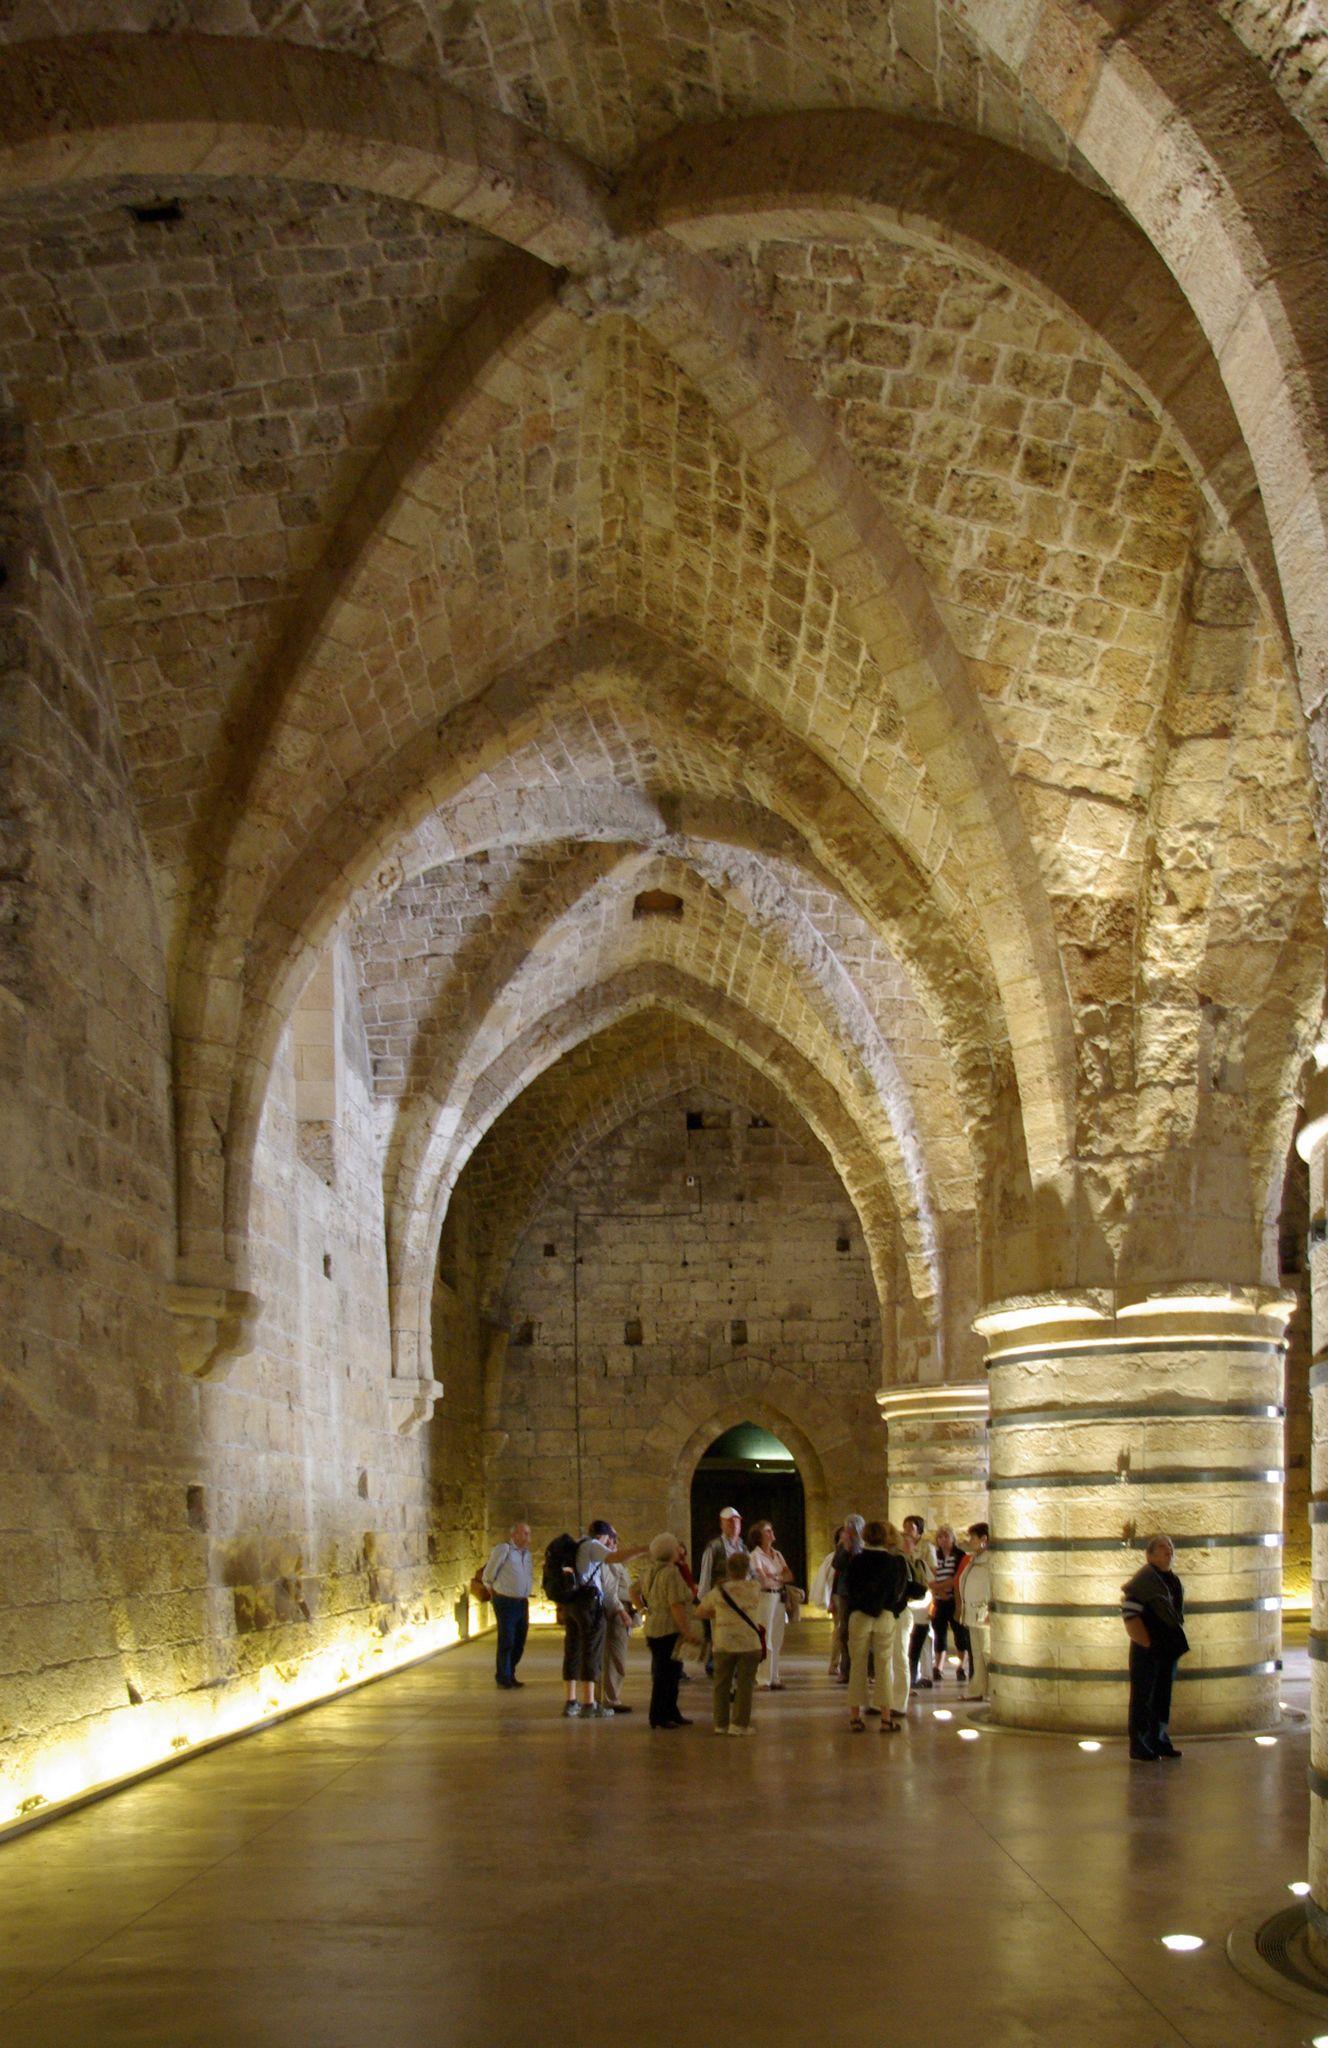 the tunnels of the knights templar in akko knights templar